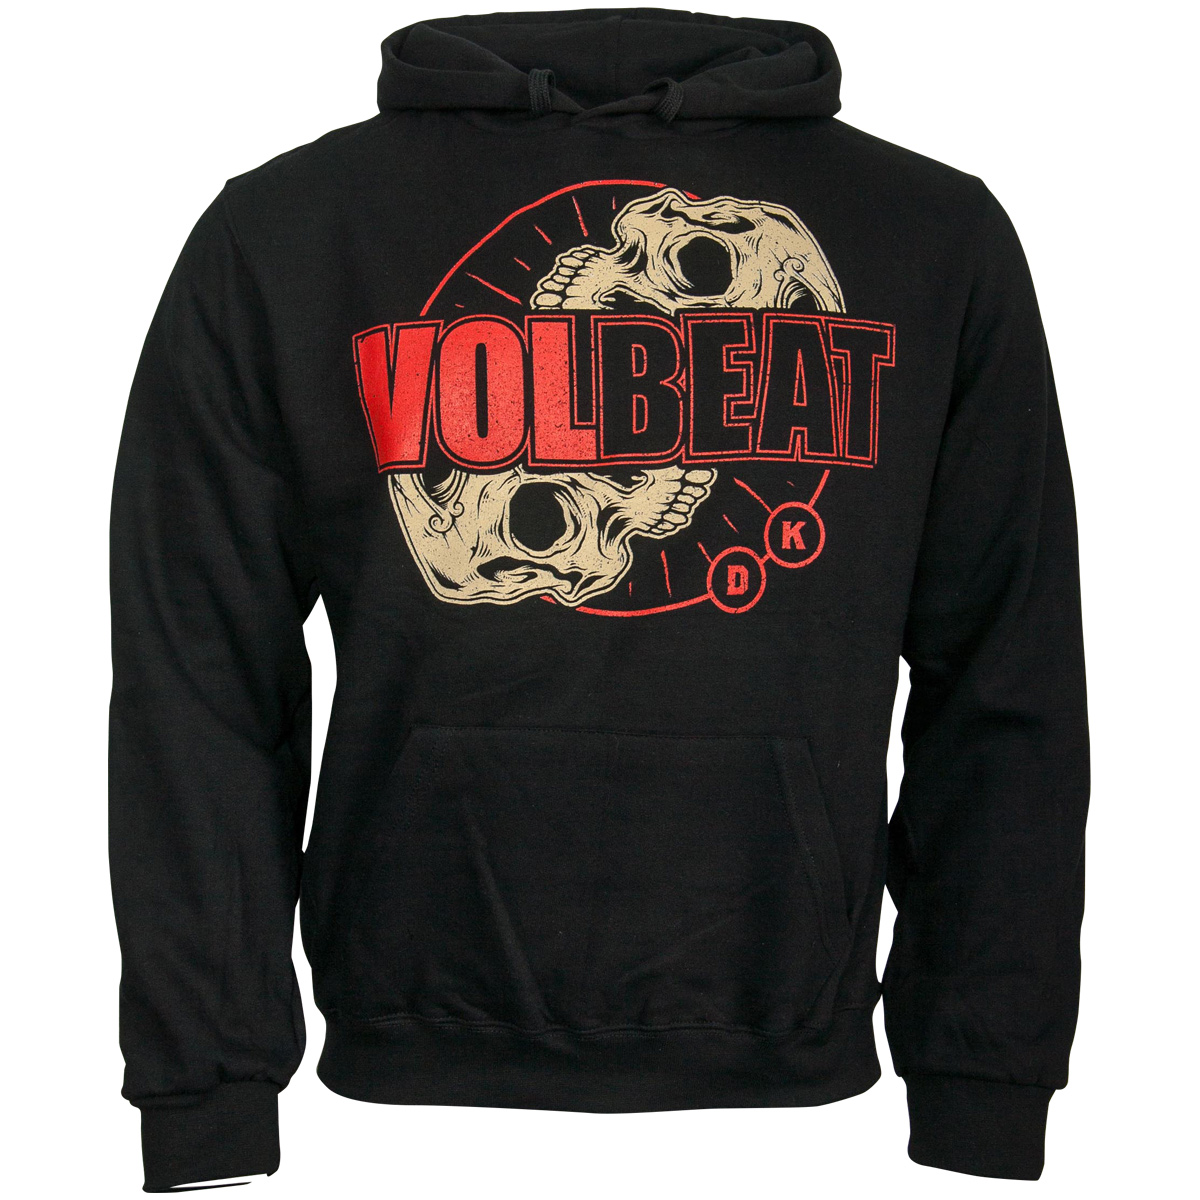 Volbeat - Kapuzenpullover Fight For Life - schwarz